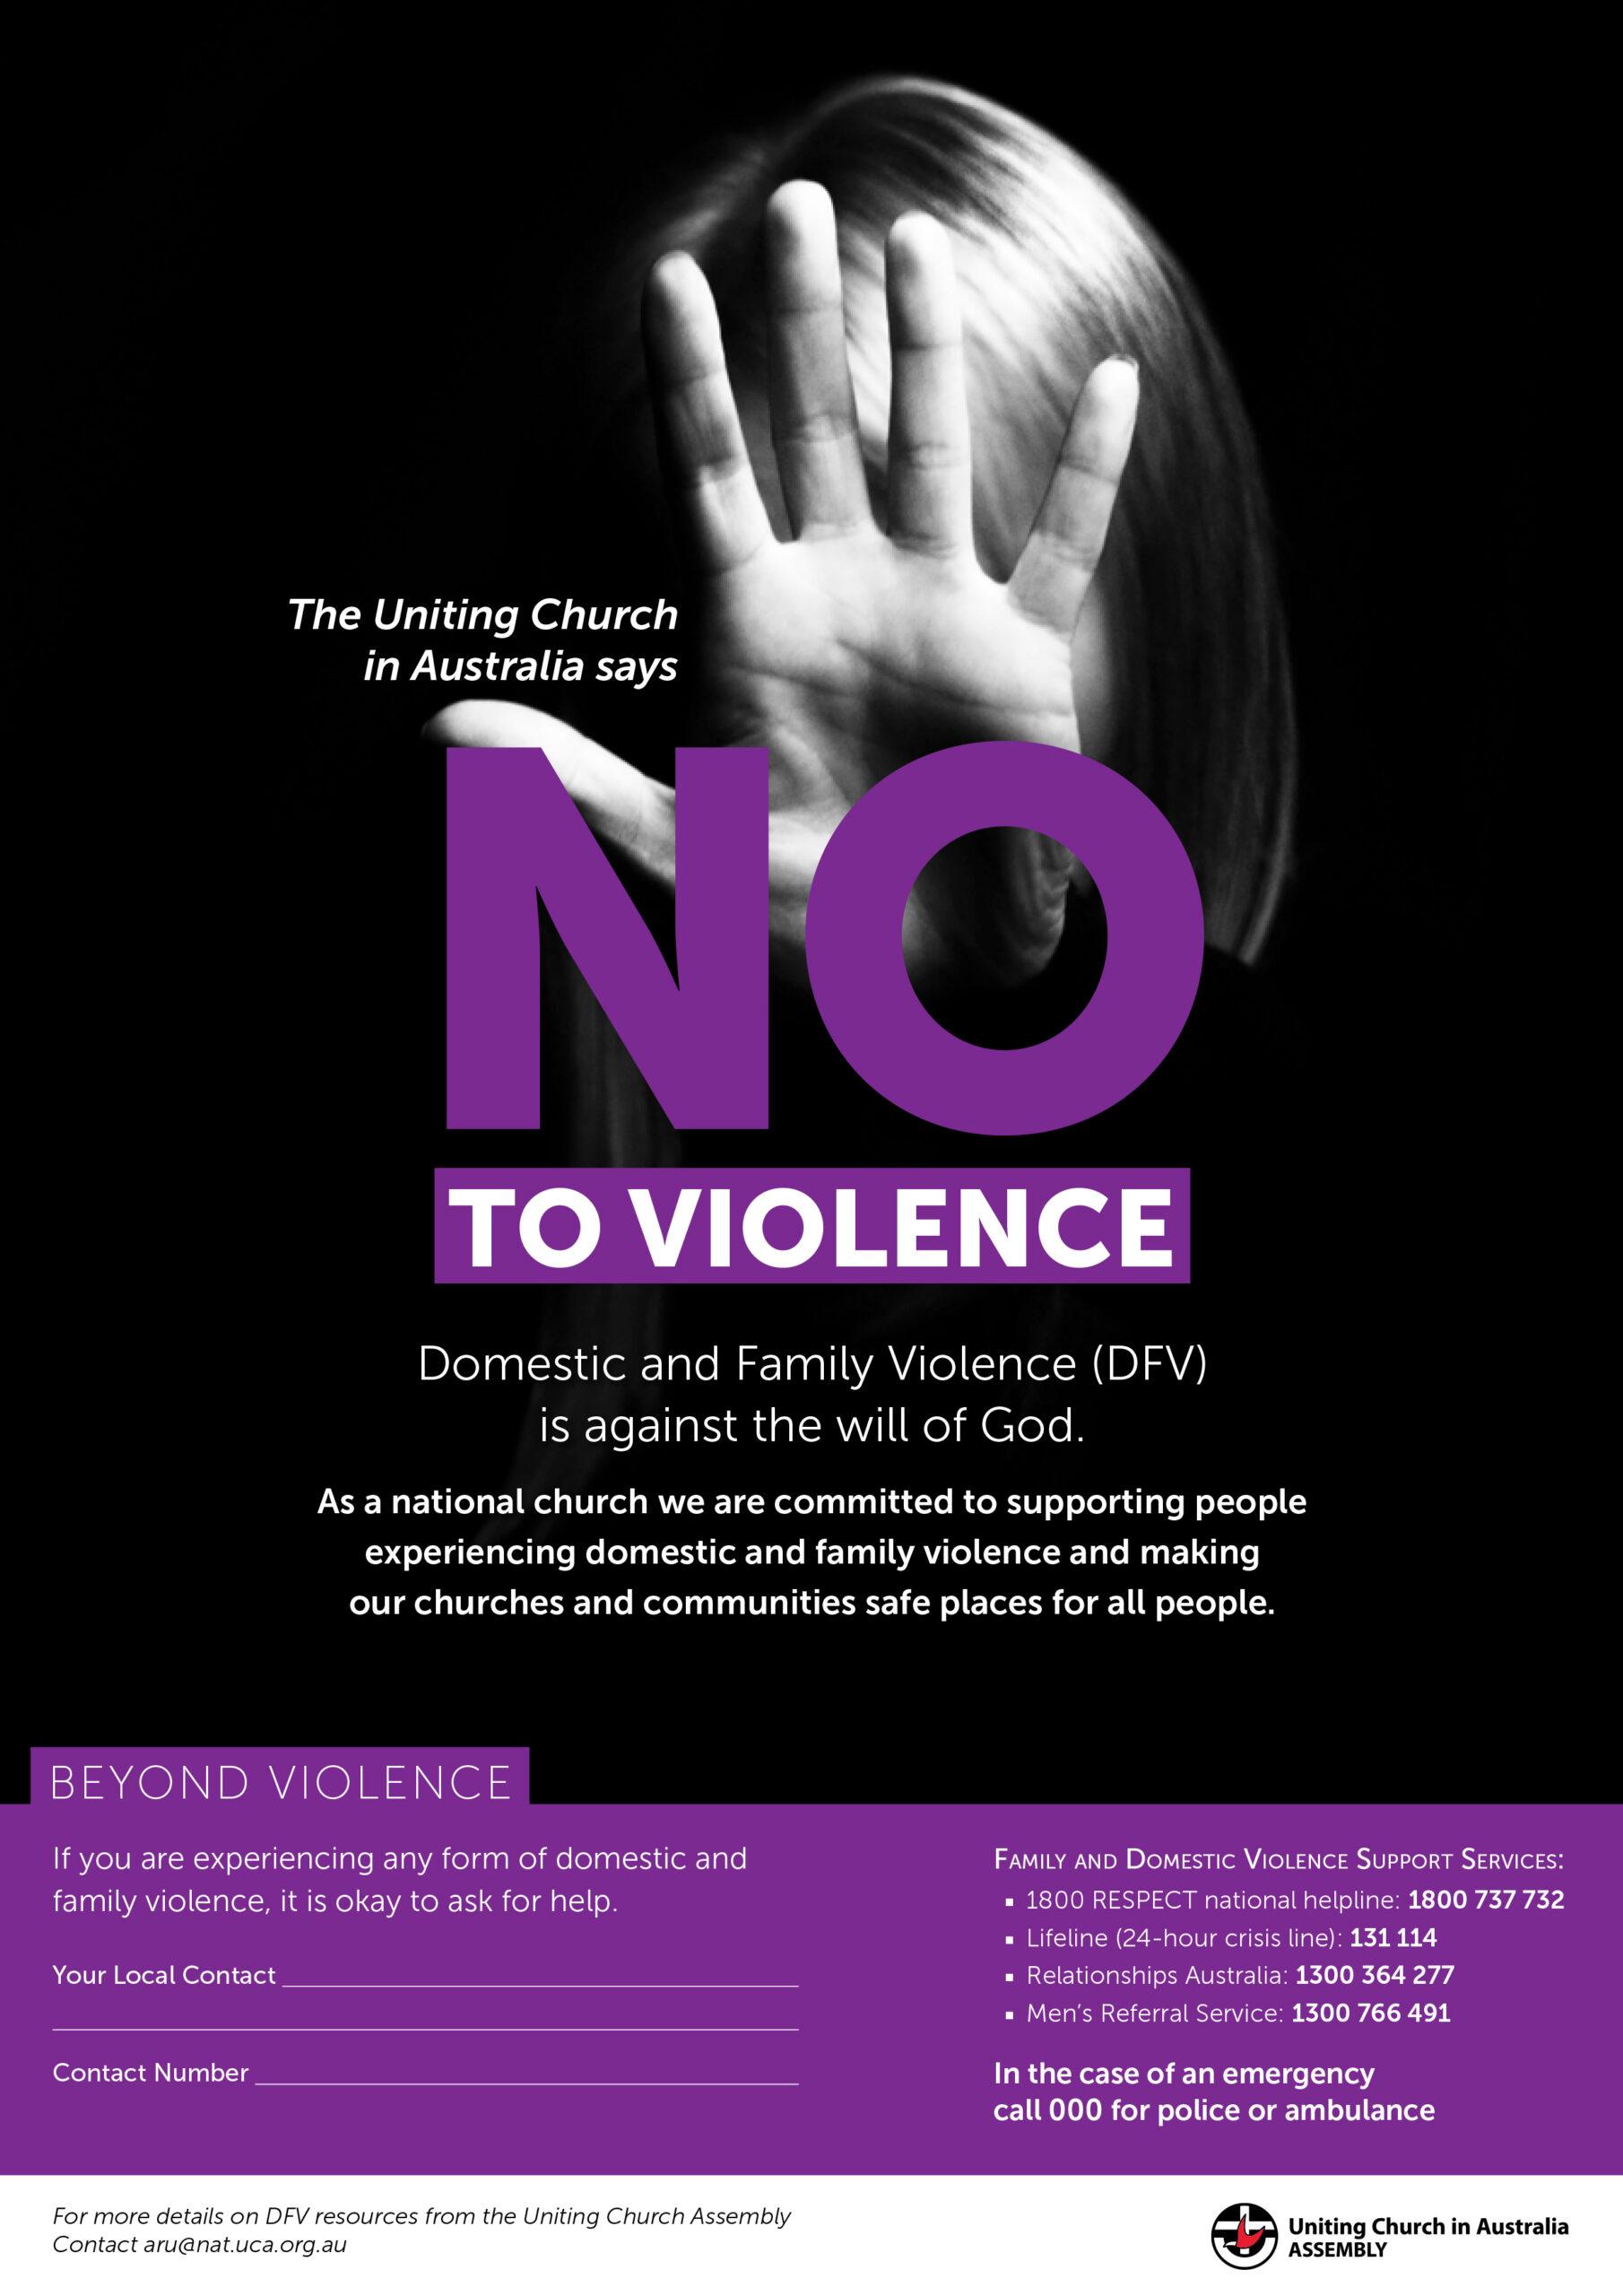 Beyond Violence, Uniting Church Australia